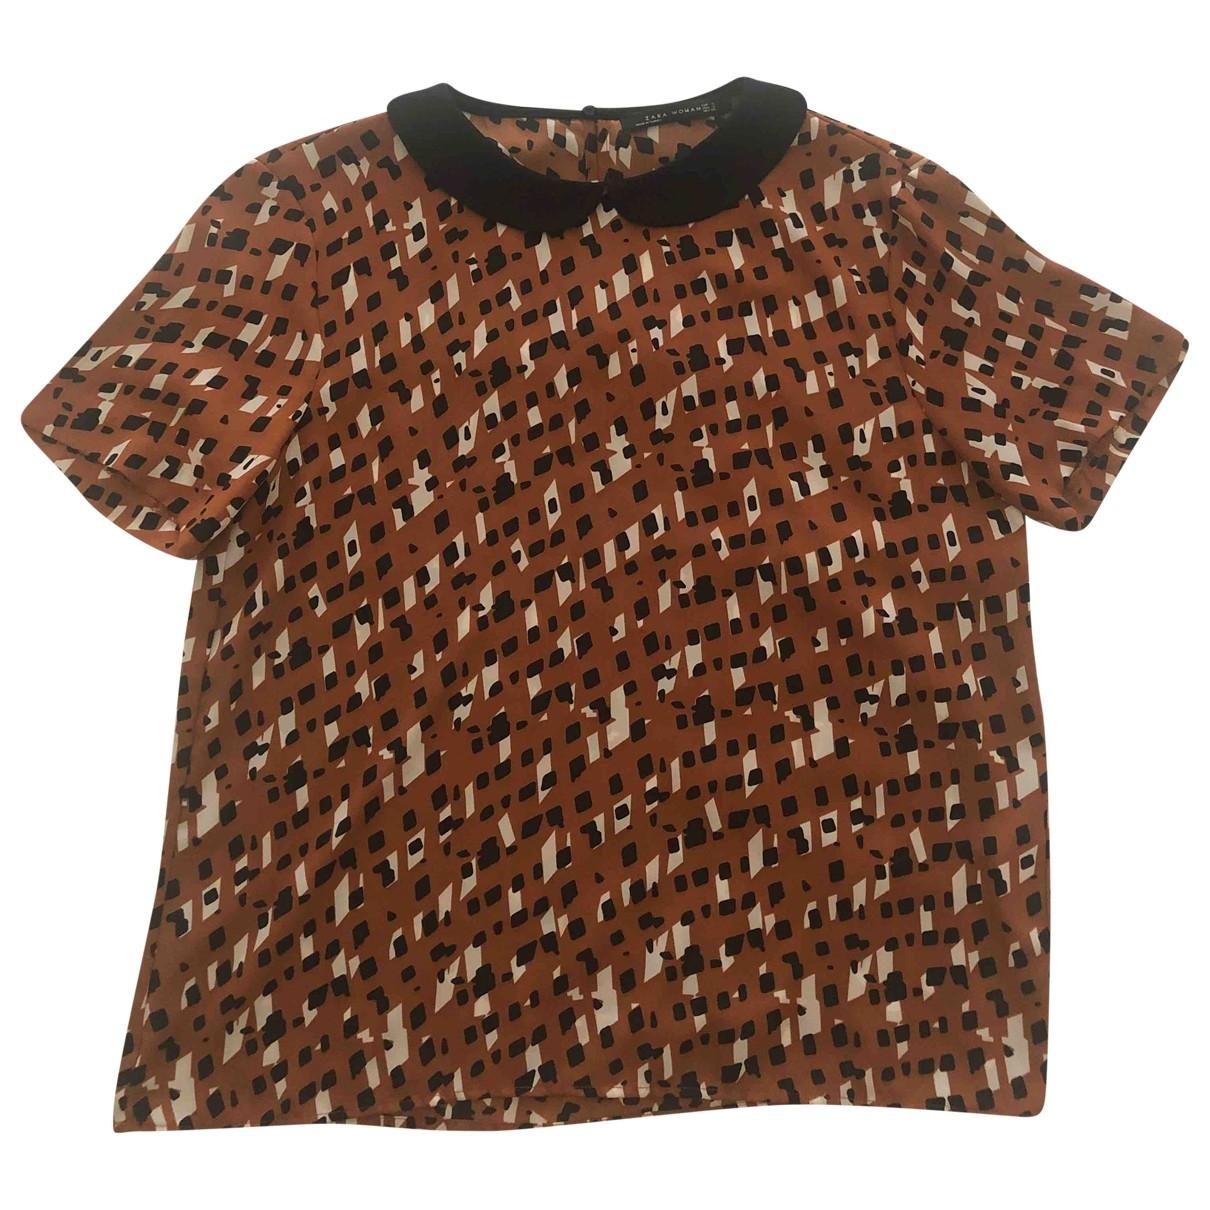 Zara \N Orange  top for Women S International